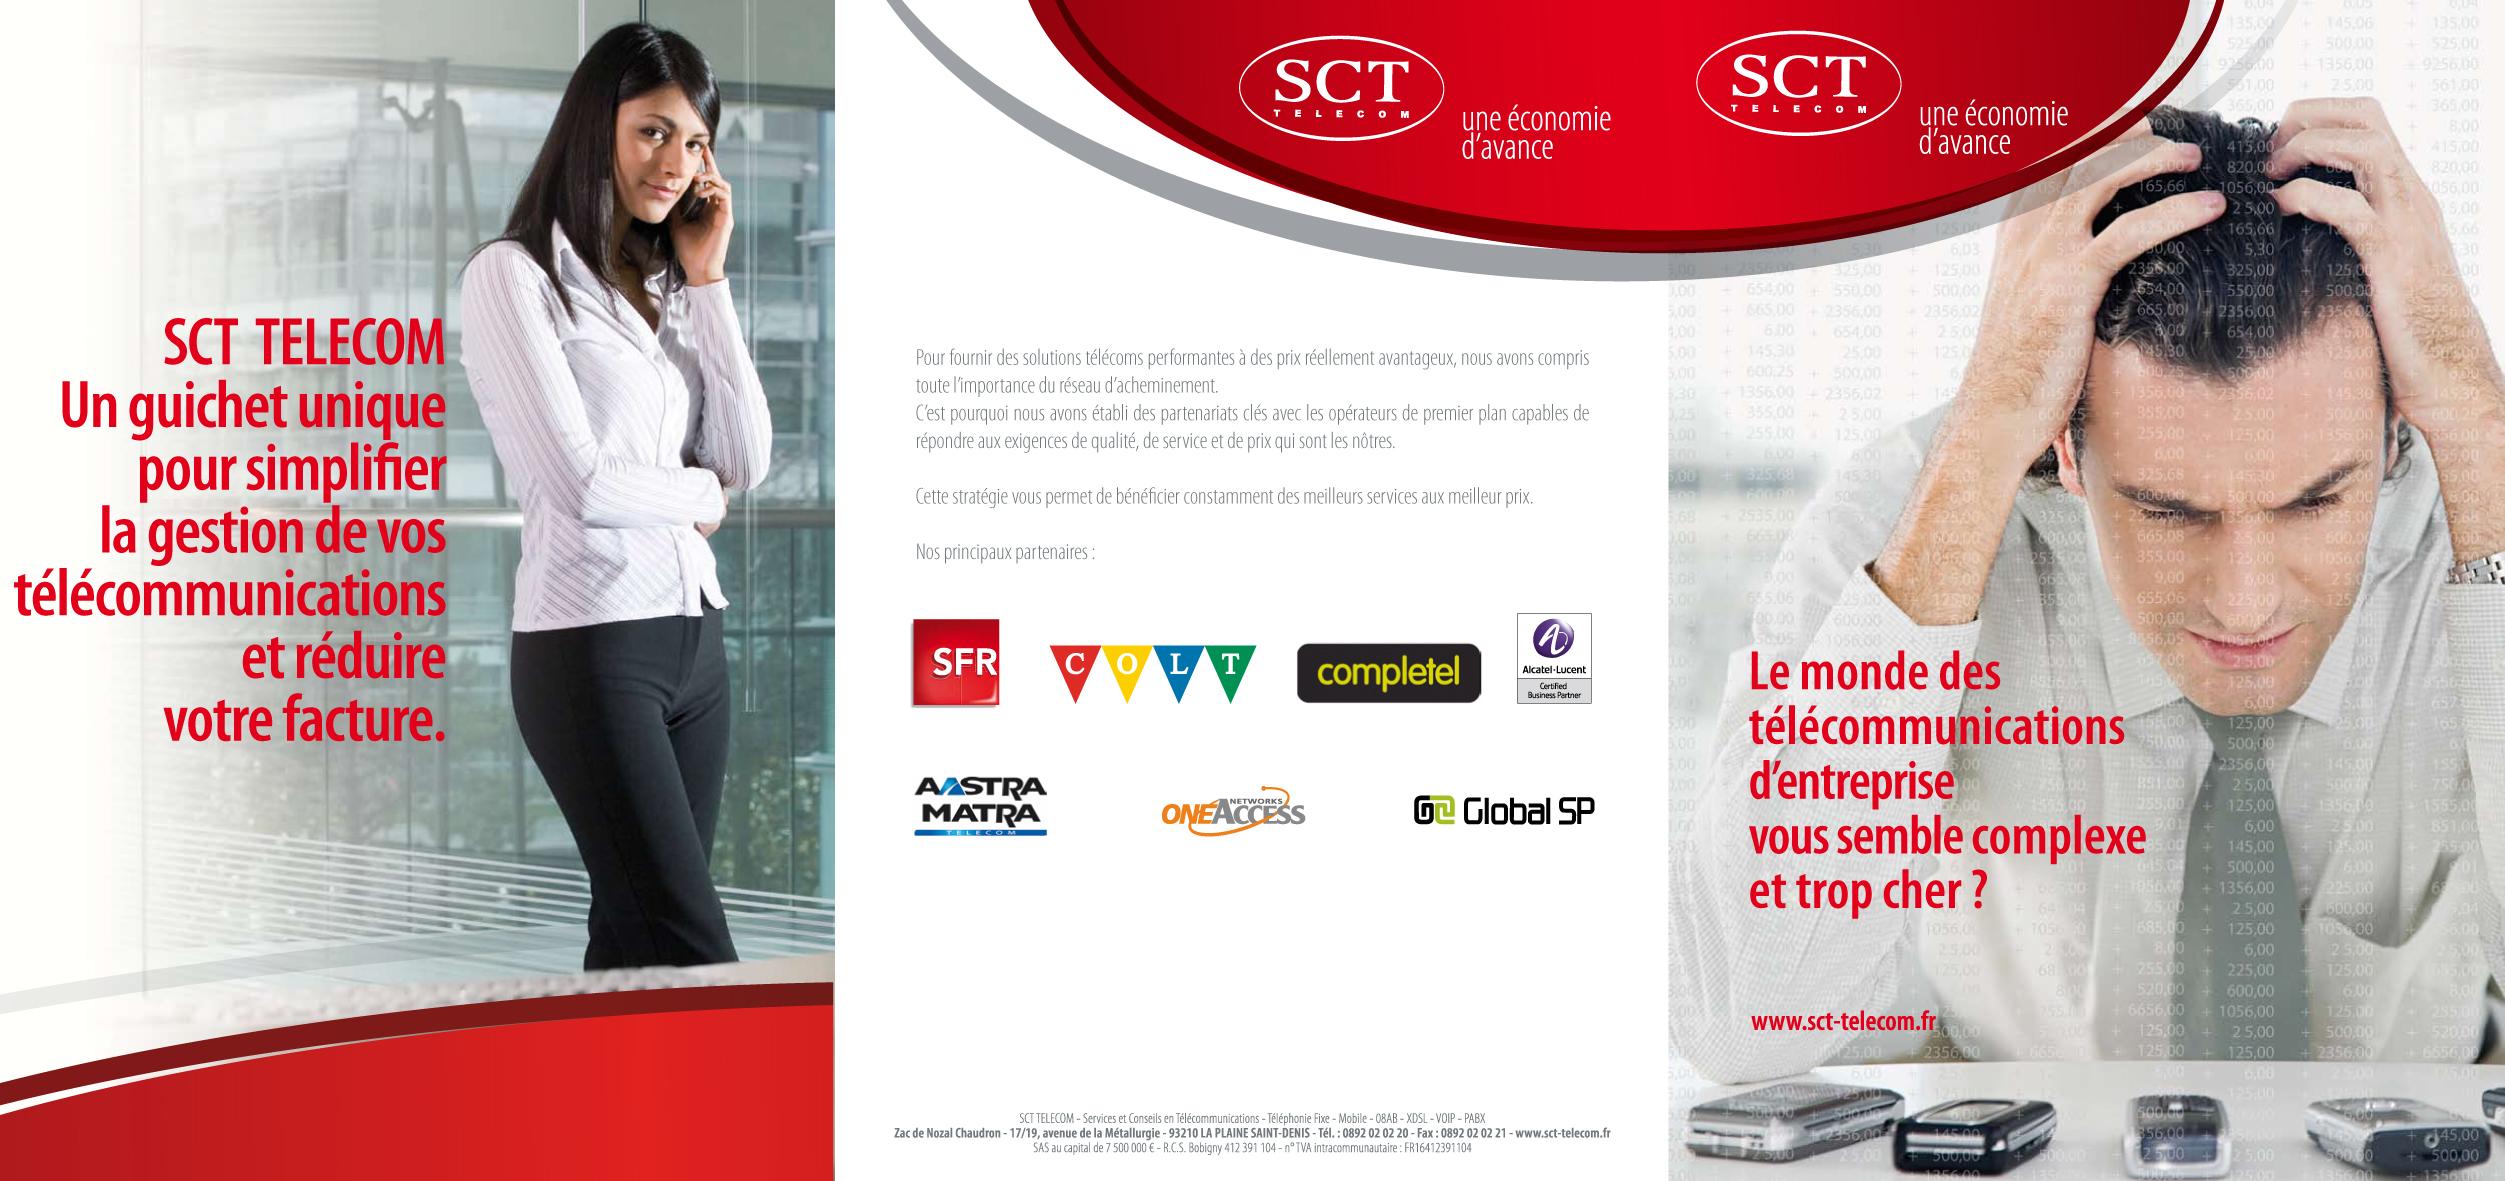 SCT-plaquette-1.jpg